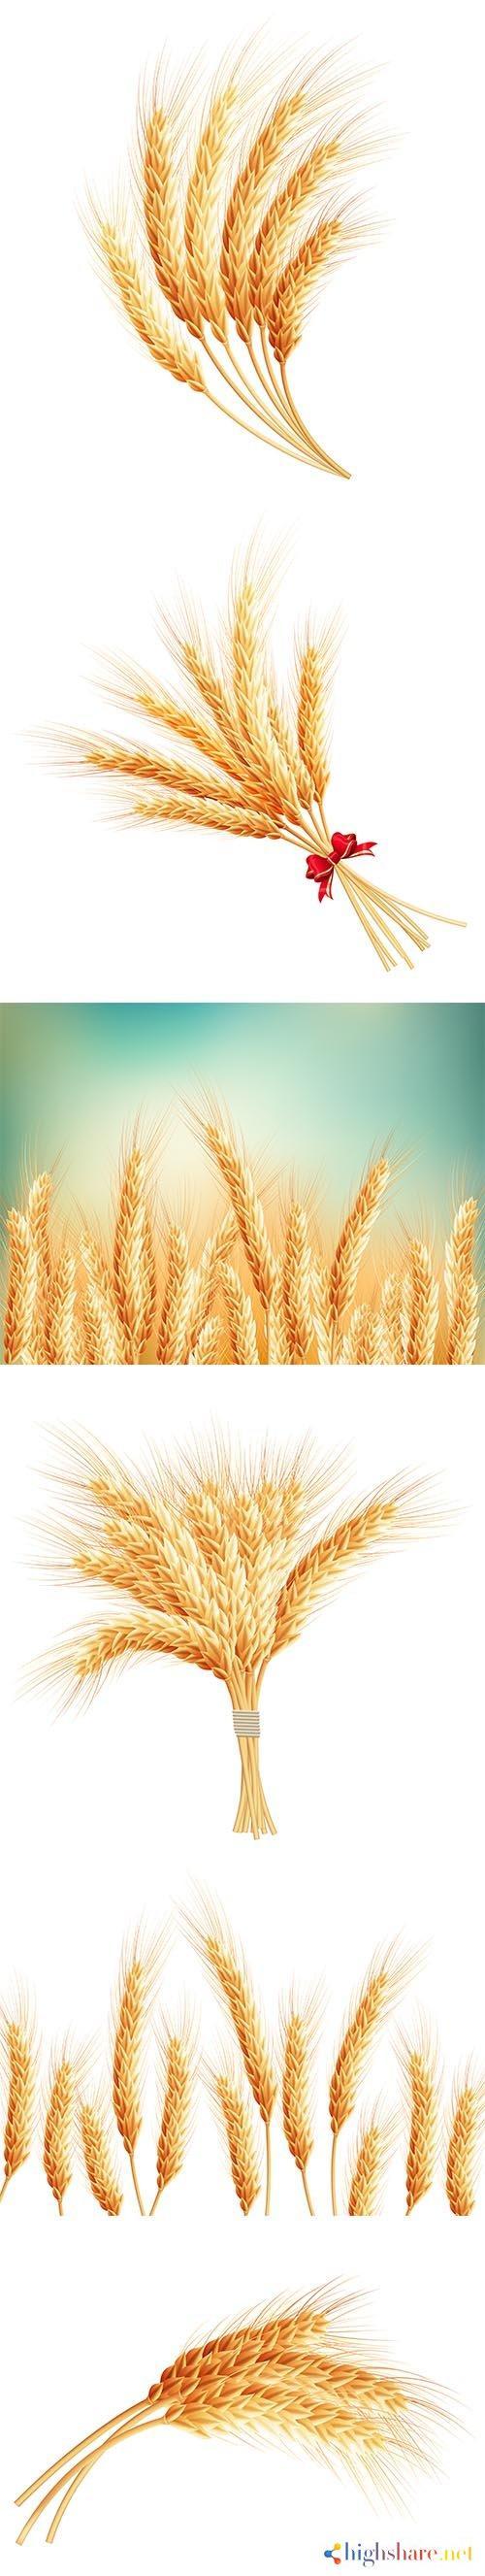 wheat ears isolated 5f409d943befe - Wheat Ears Isolated